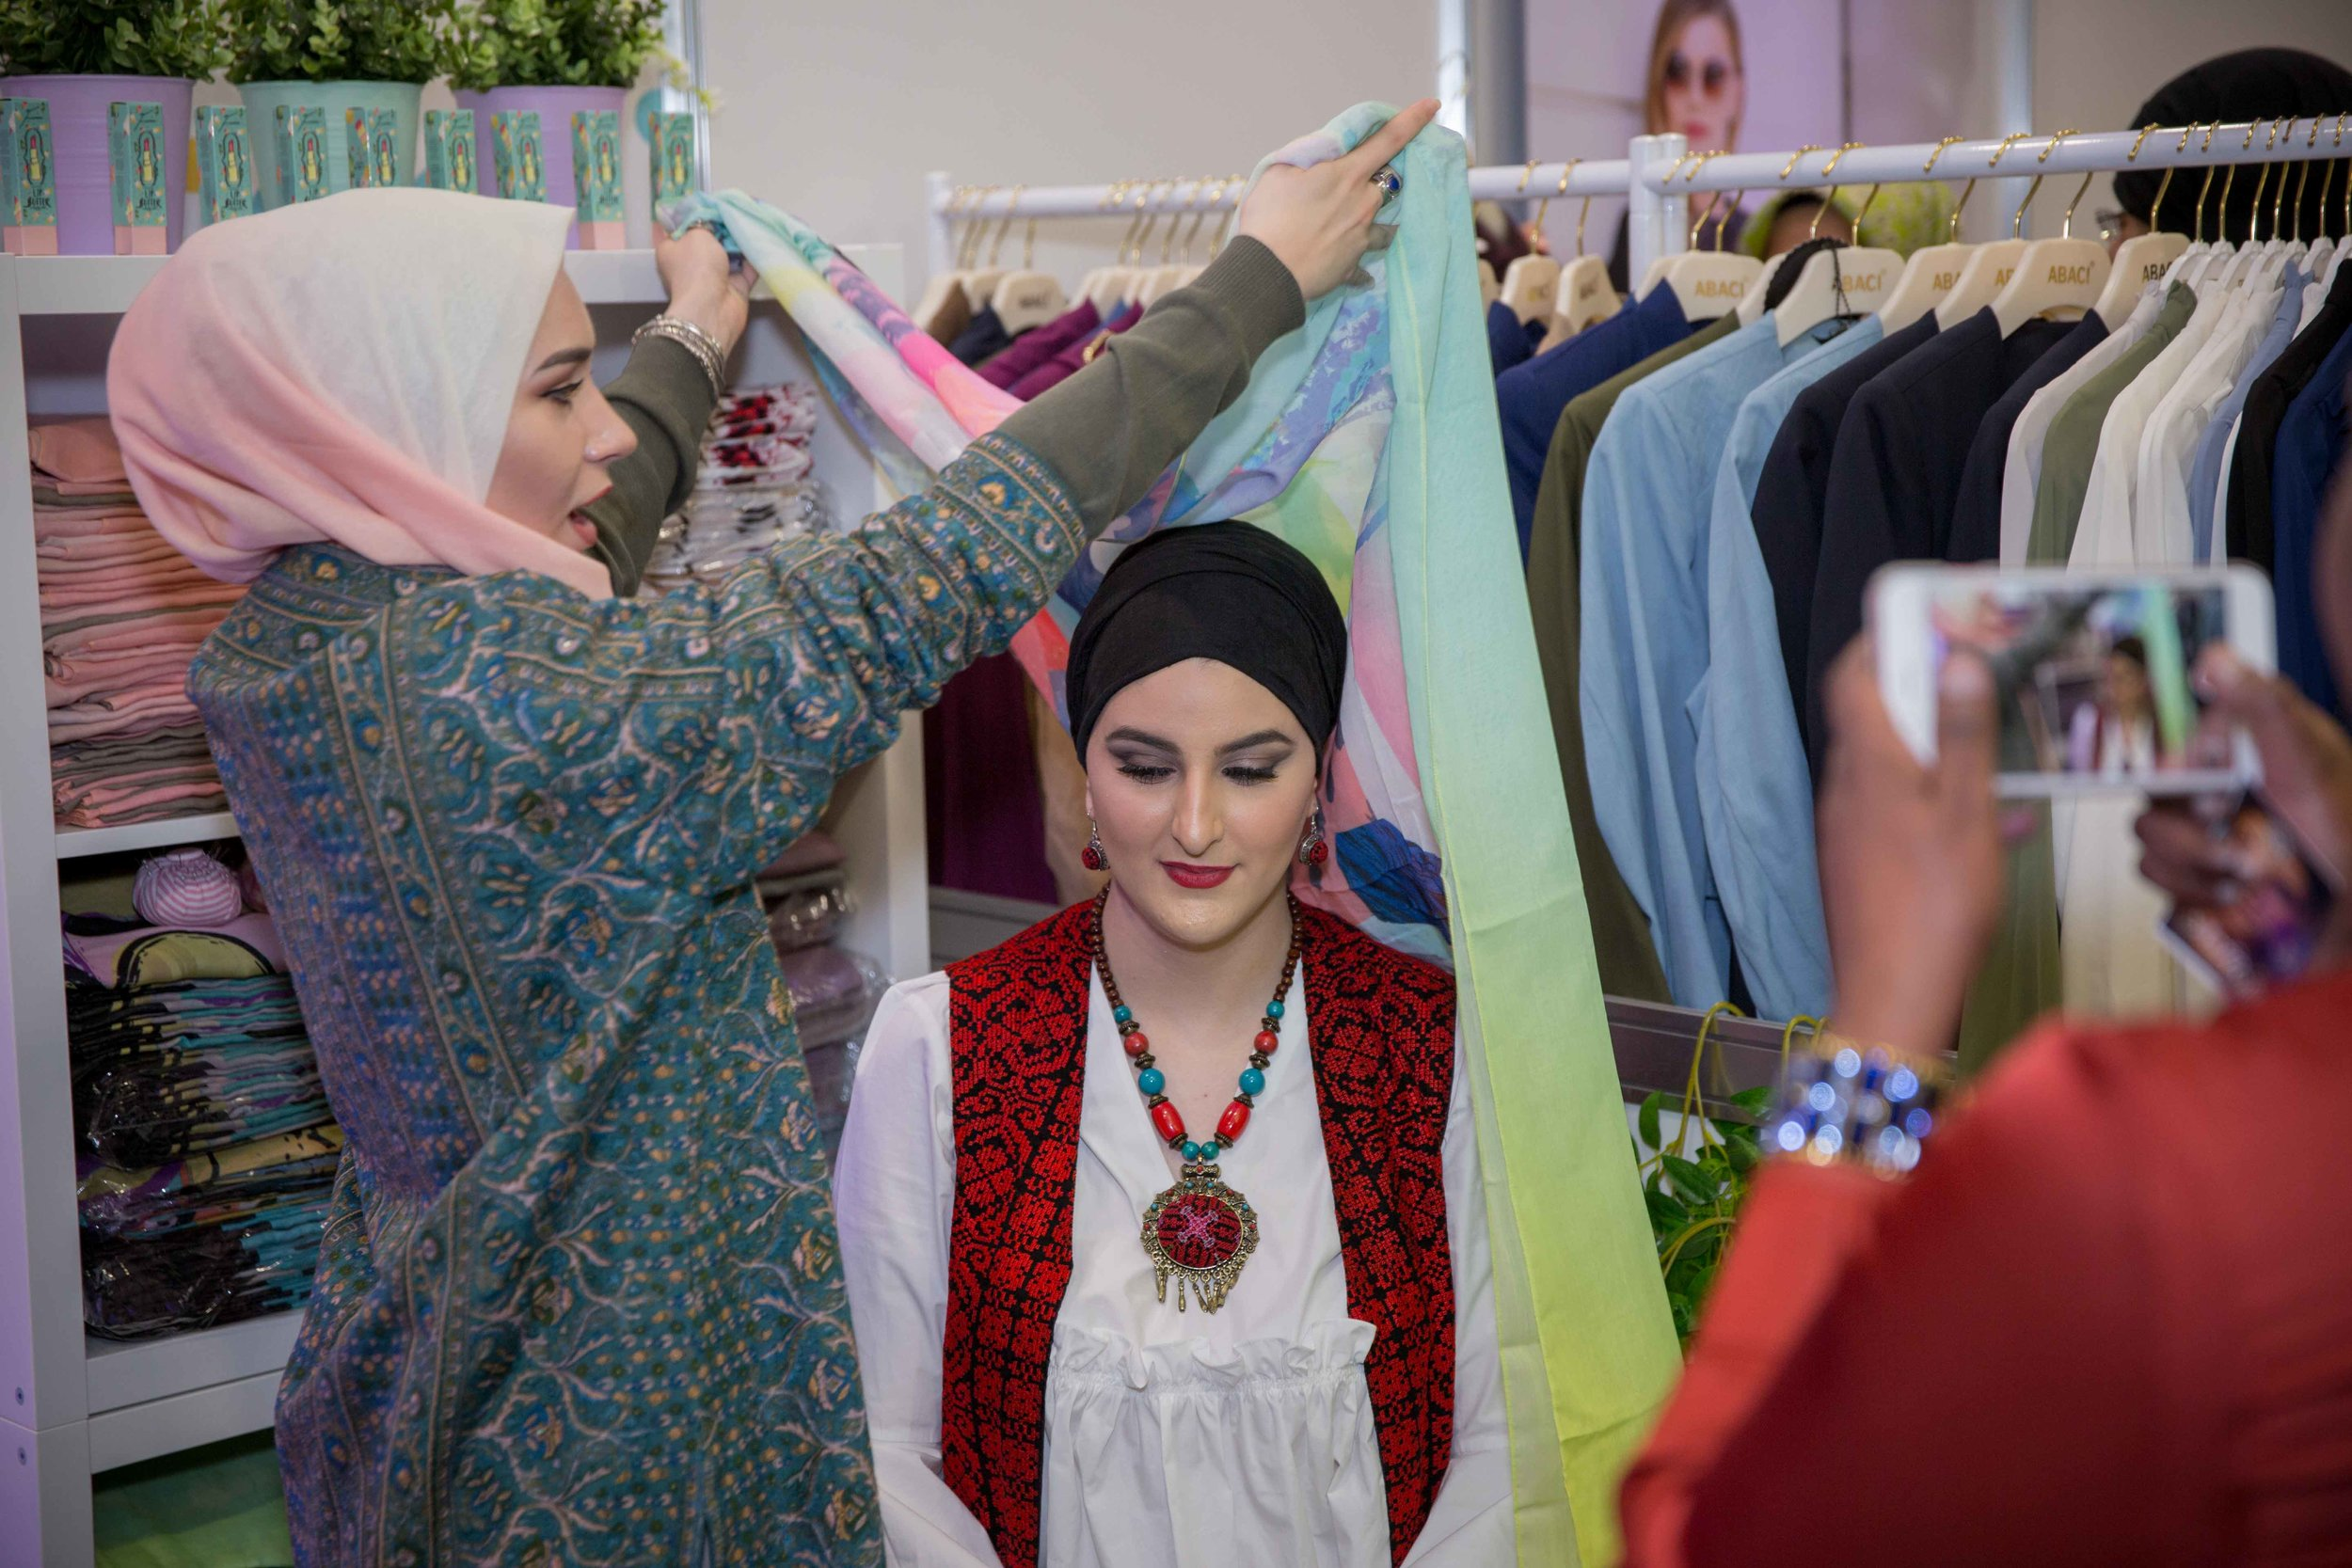 Aidijuma-London-Modest-Fashion-Week-catwalk-photographer-natalia-smith-photography-7.jpg